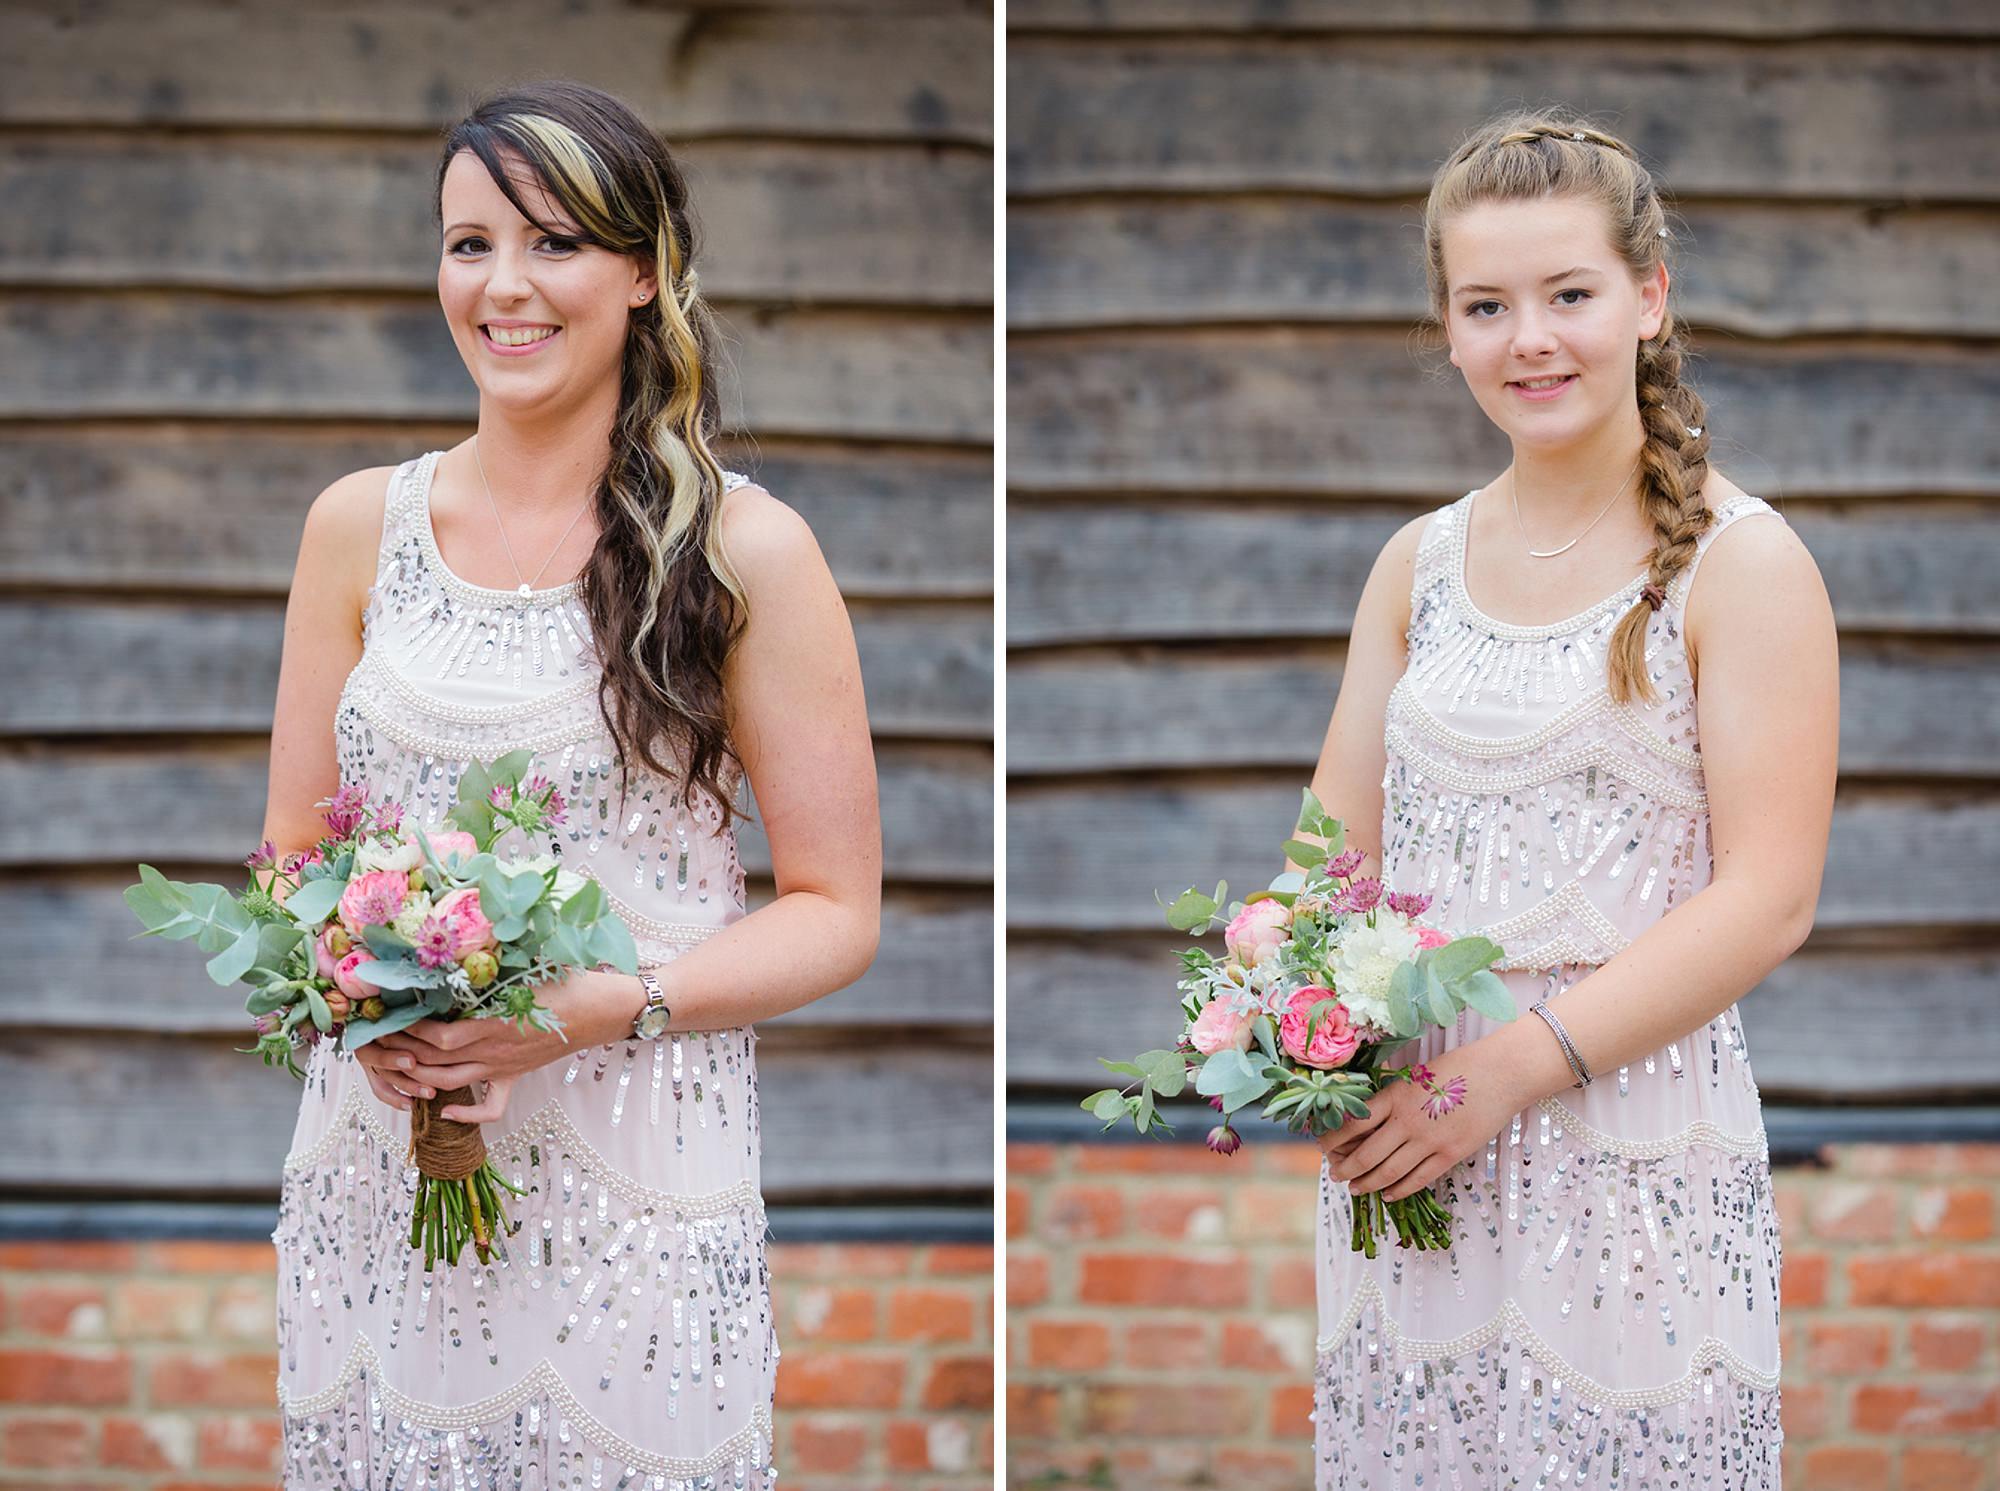 outdoor humanist wedding photography portrait of bridesmaids